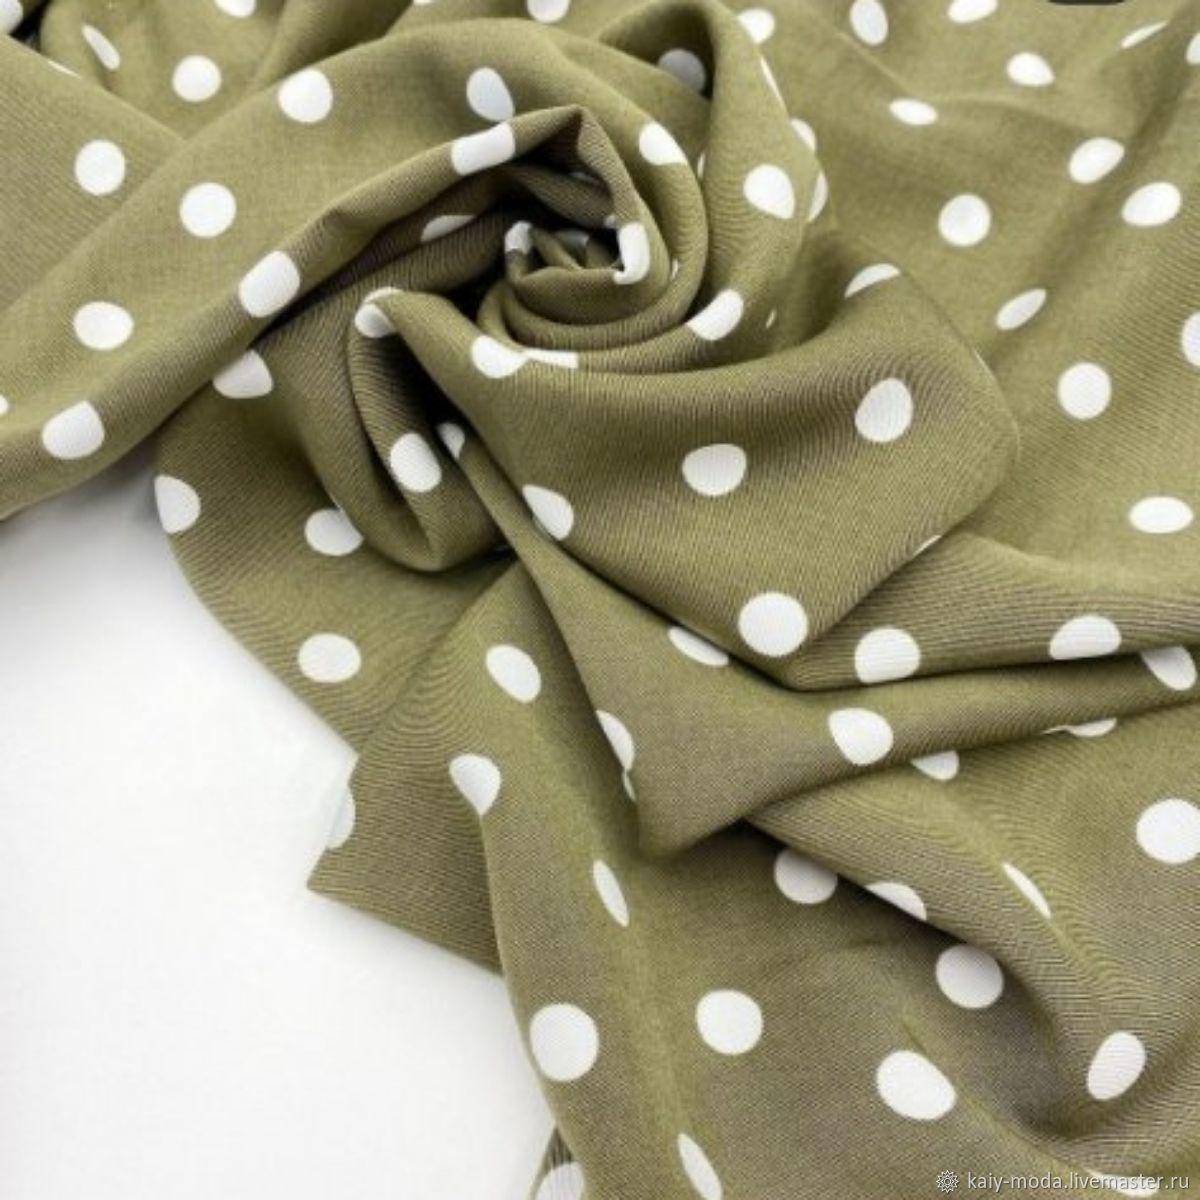 Viscose platelnaya polka dots on olive oil, Fabric, Moscow,  Фото №1